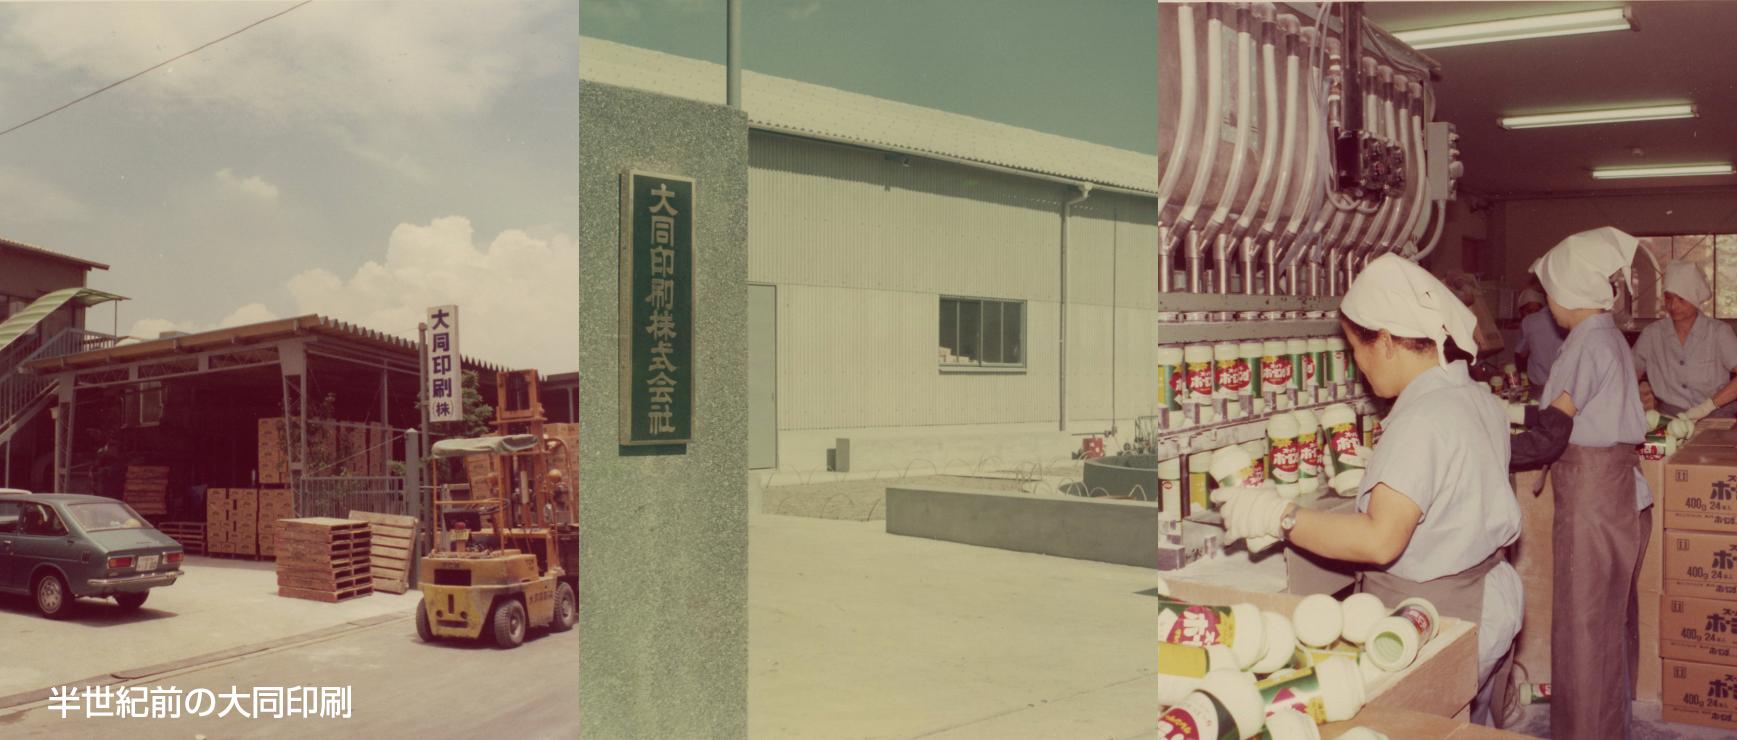 大同印刷の歴史,昭和29年創業,長い歴史